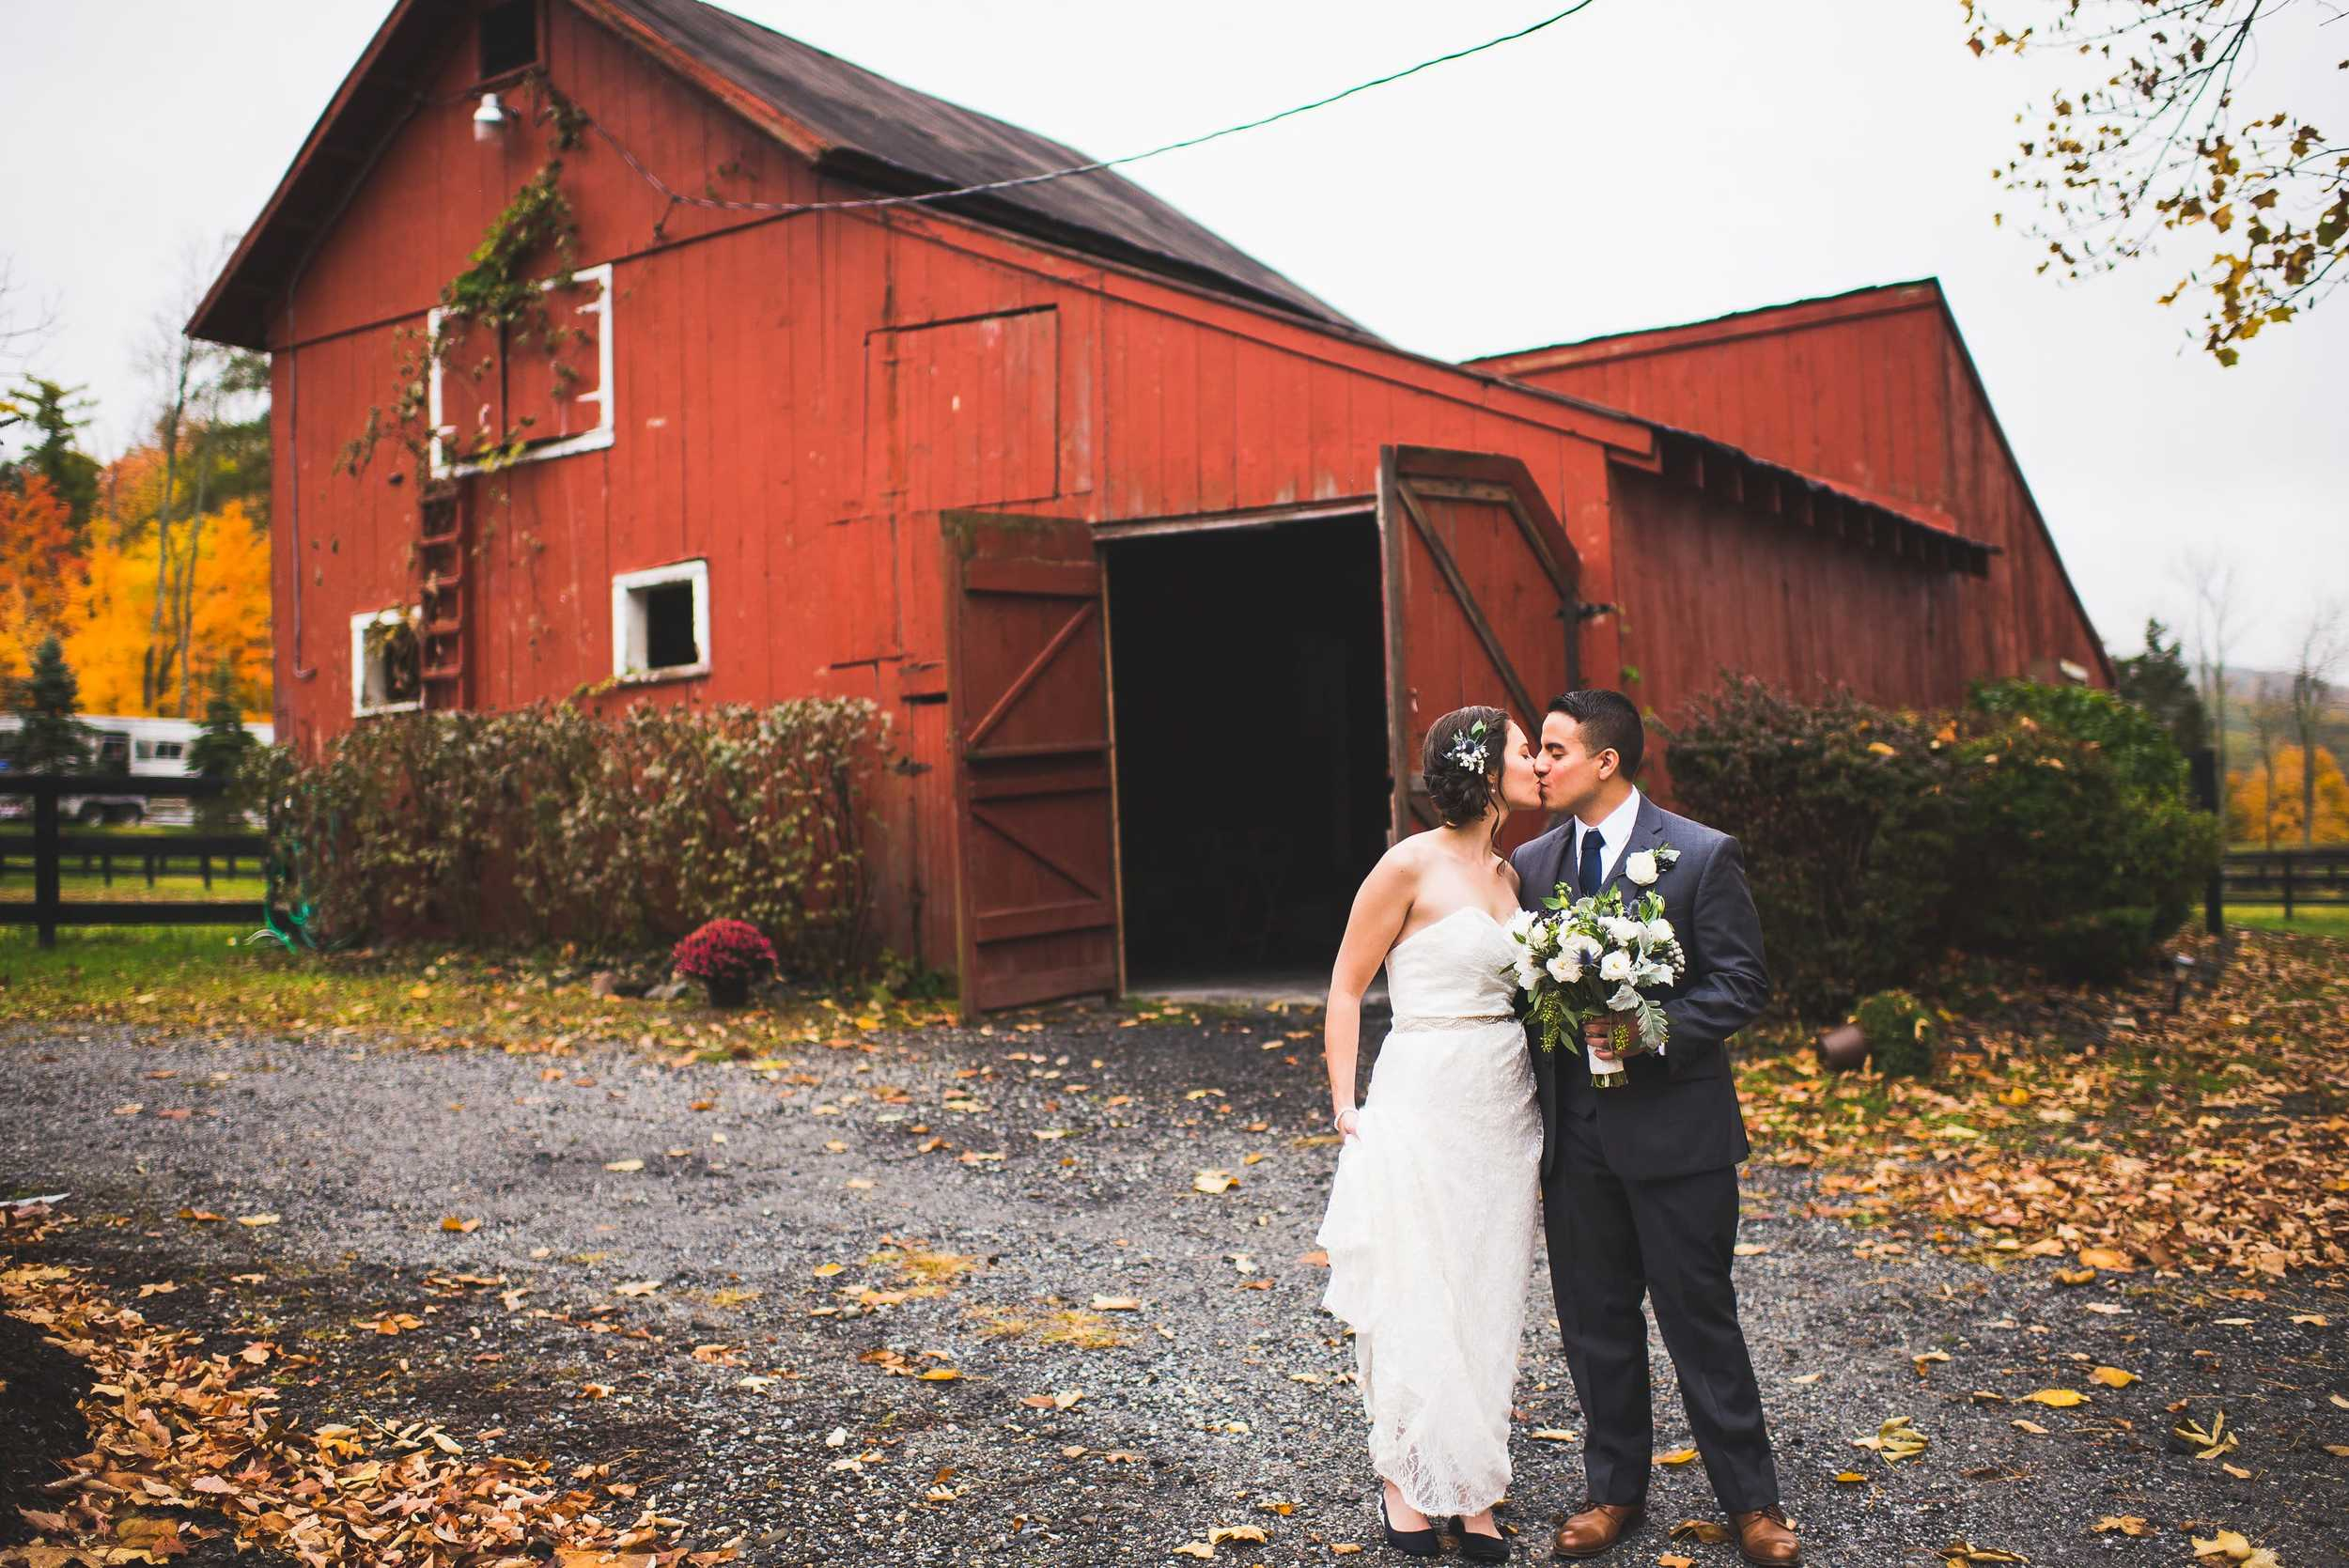 New-York-Wedding-Photographer-Falkirk-Wedding(81of163)-min.jpg